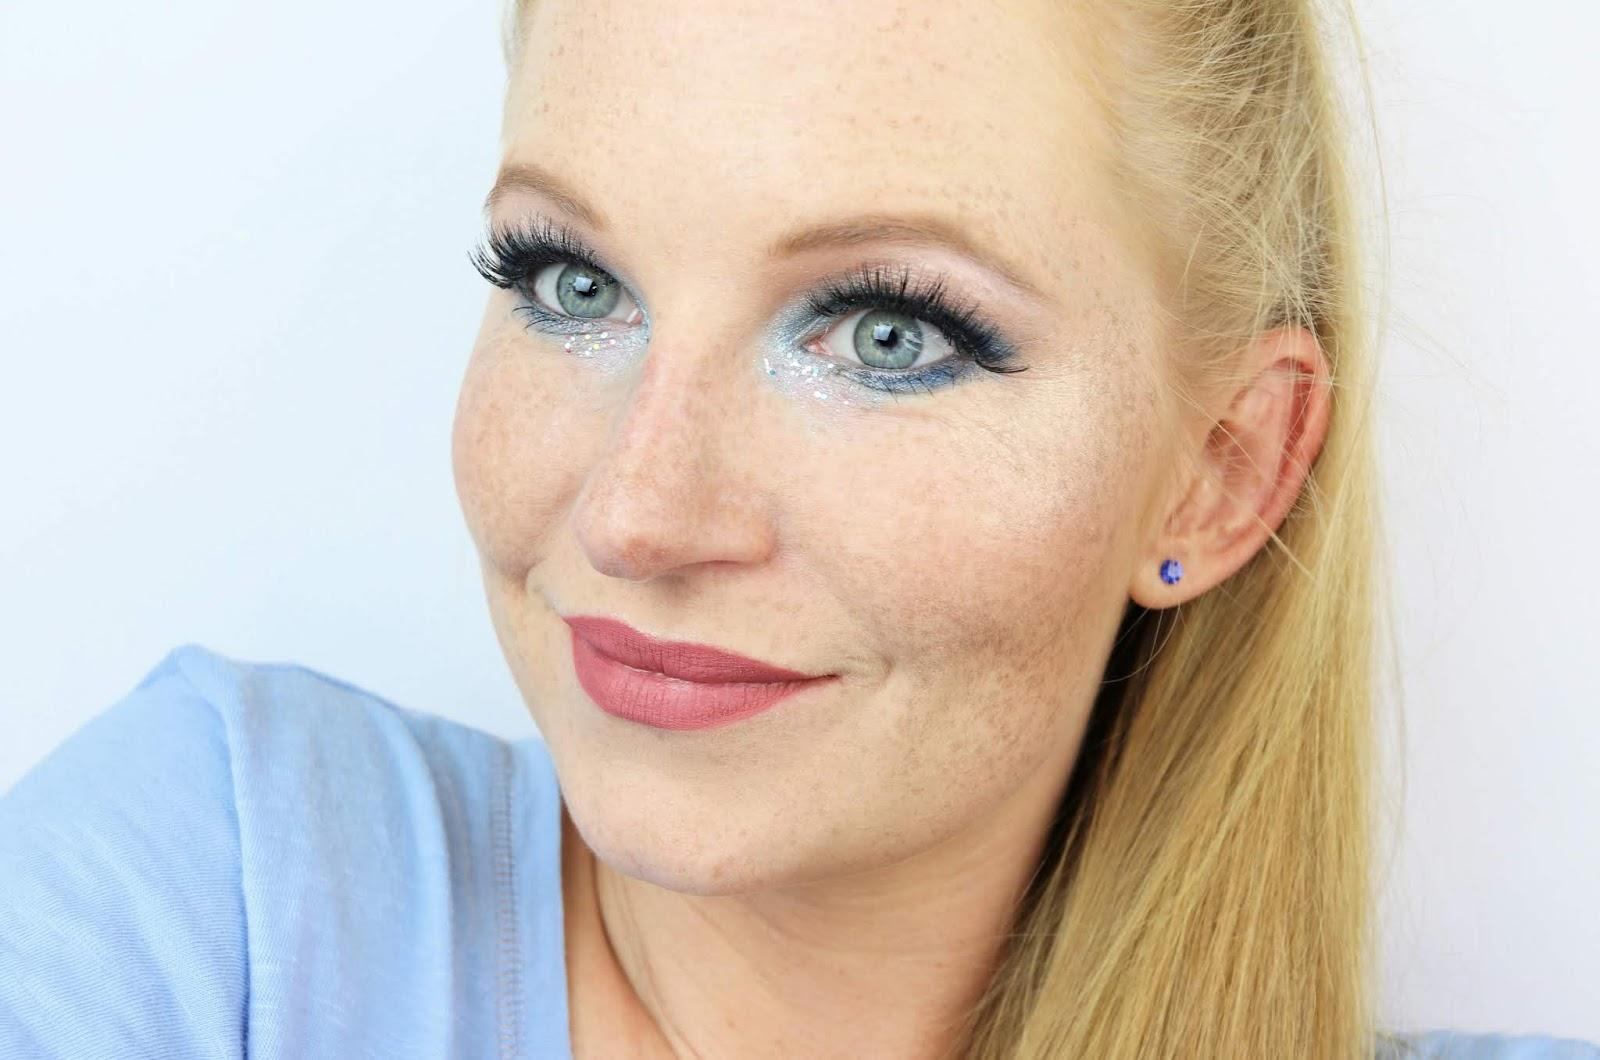 https://www.zaphiraw.de/2019/01/blue-silver-make-up-zum-lidschatten-11.html